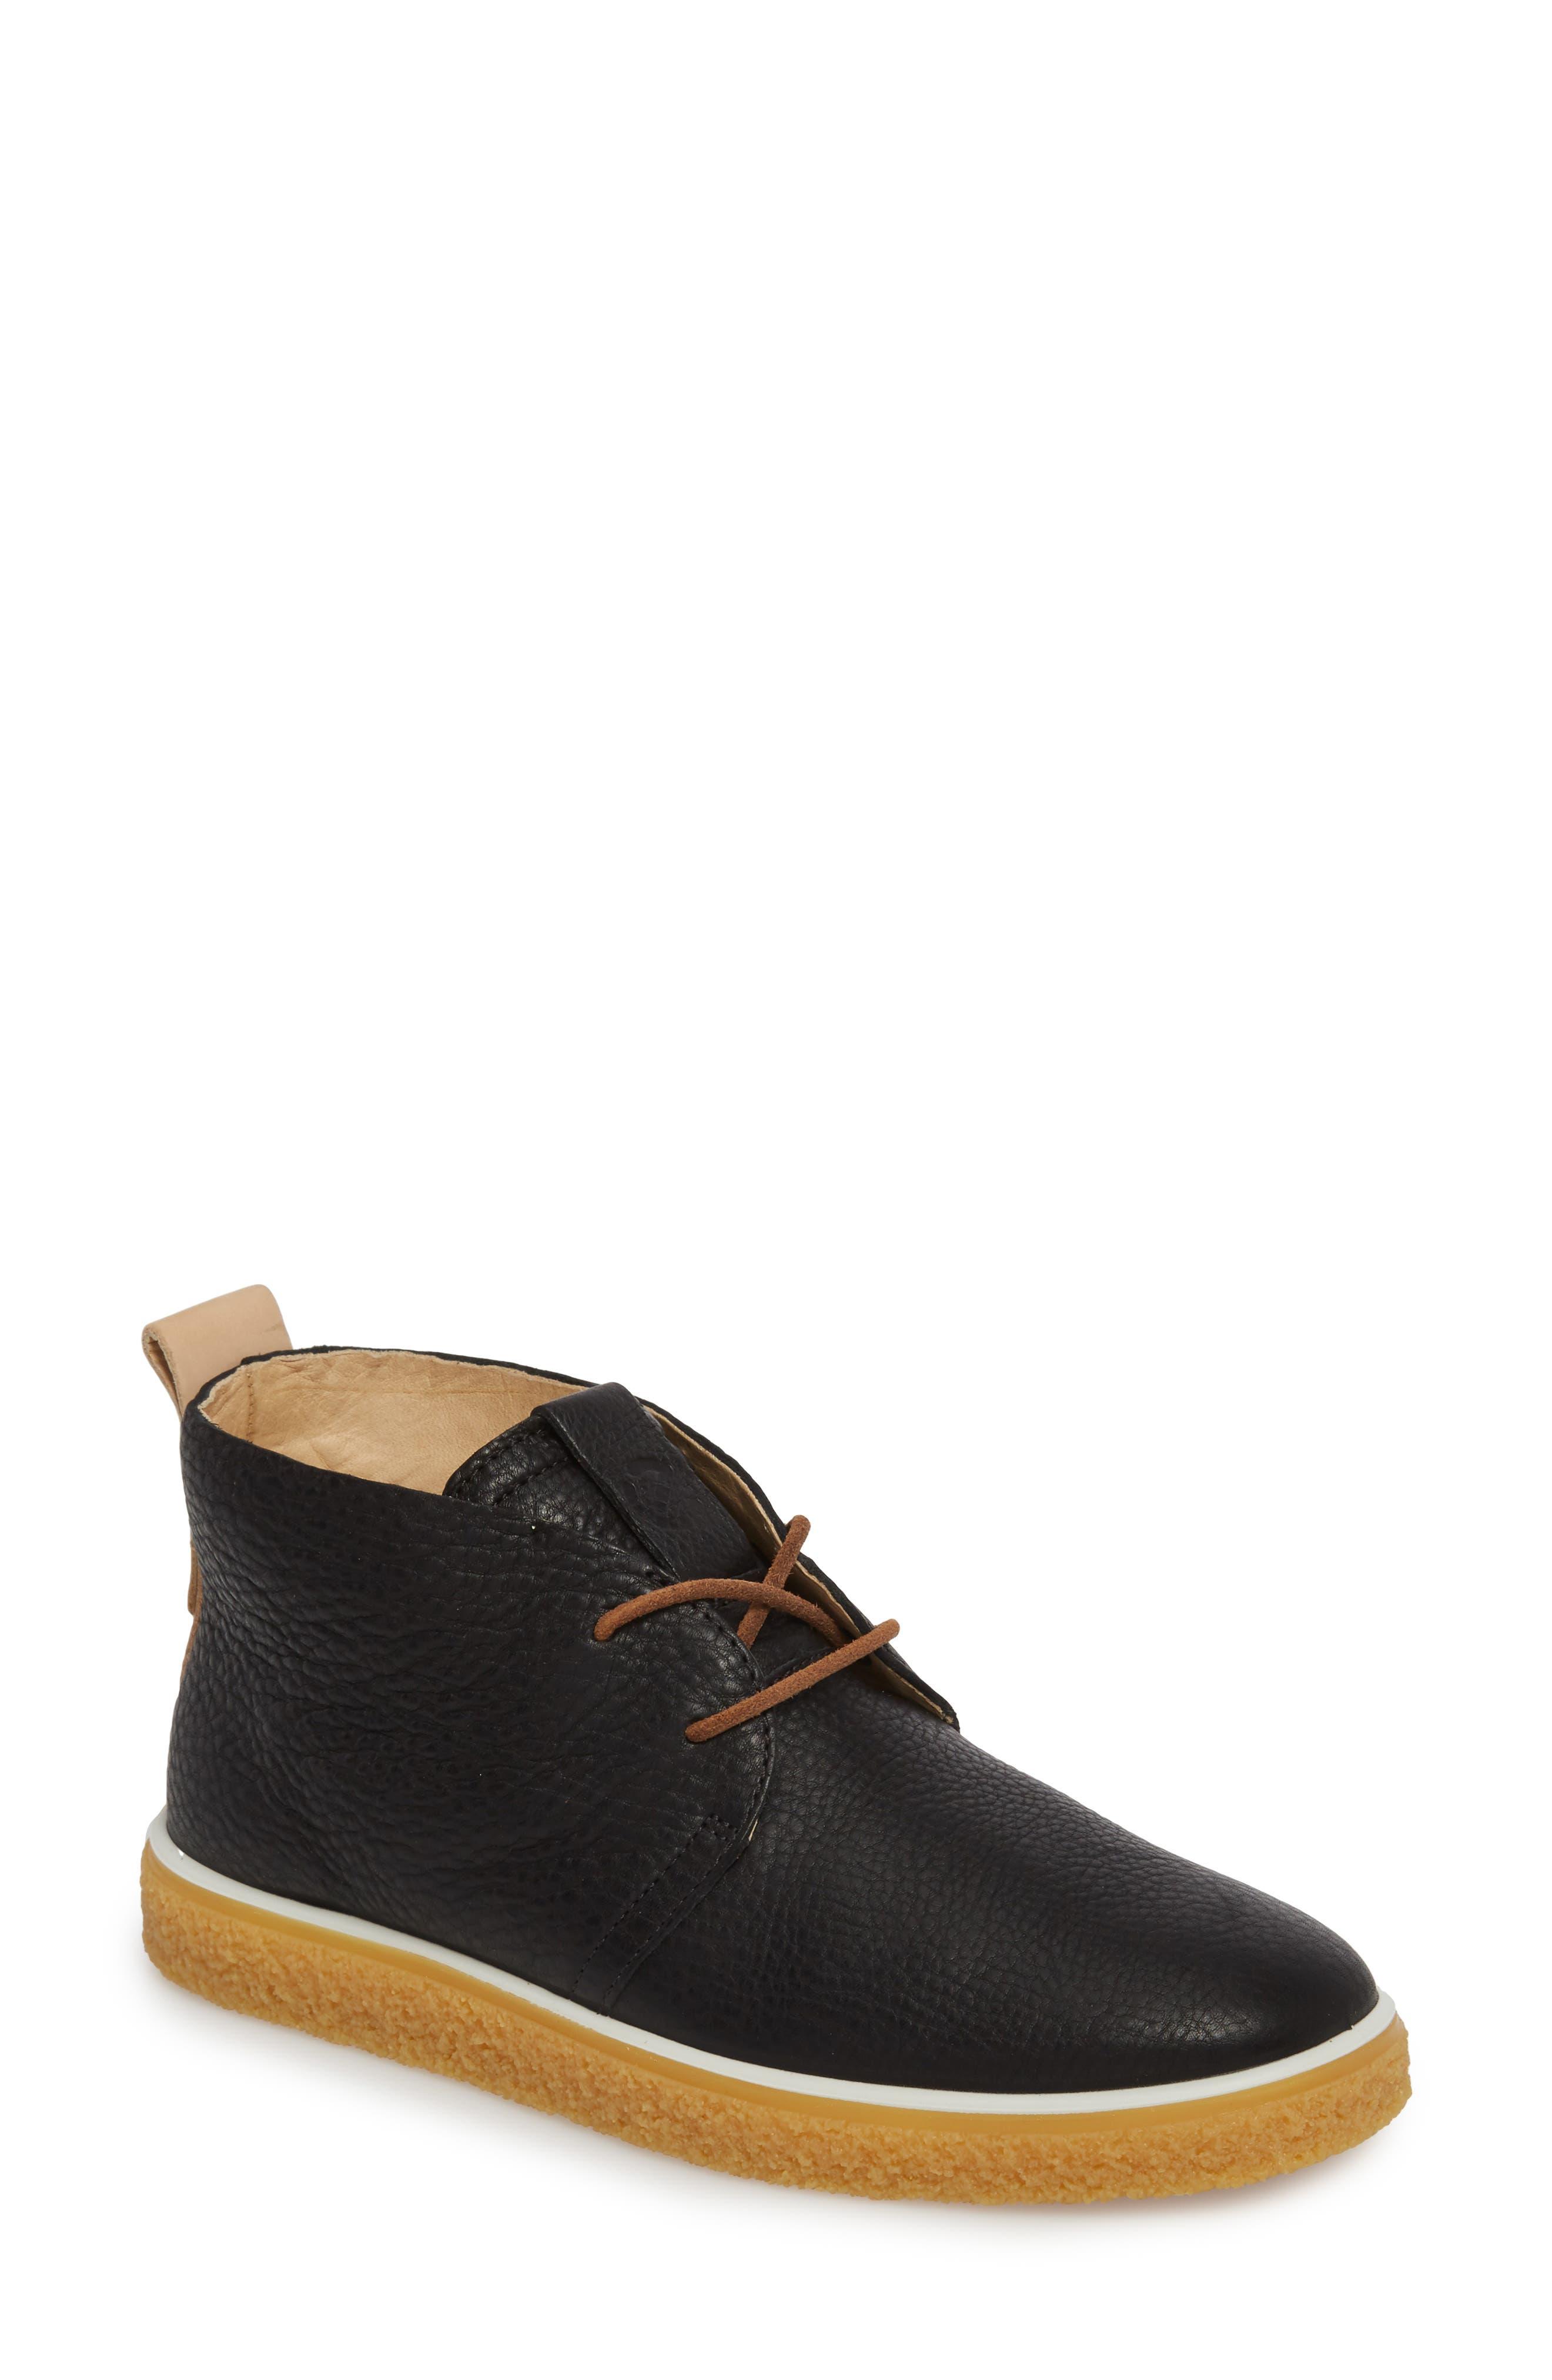 Crepetray Chukka Boot,                         Main,                         color, Black Powder Leather